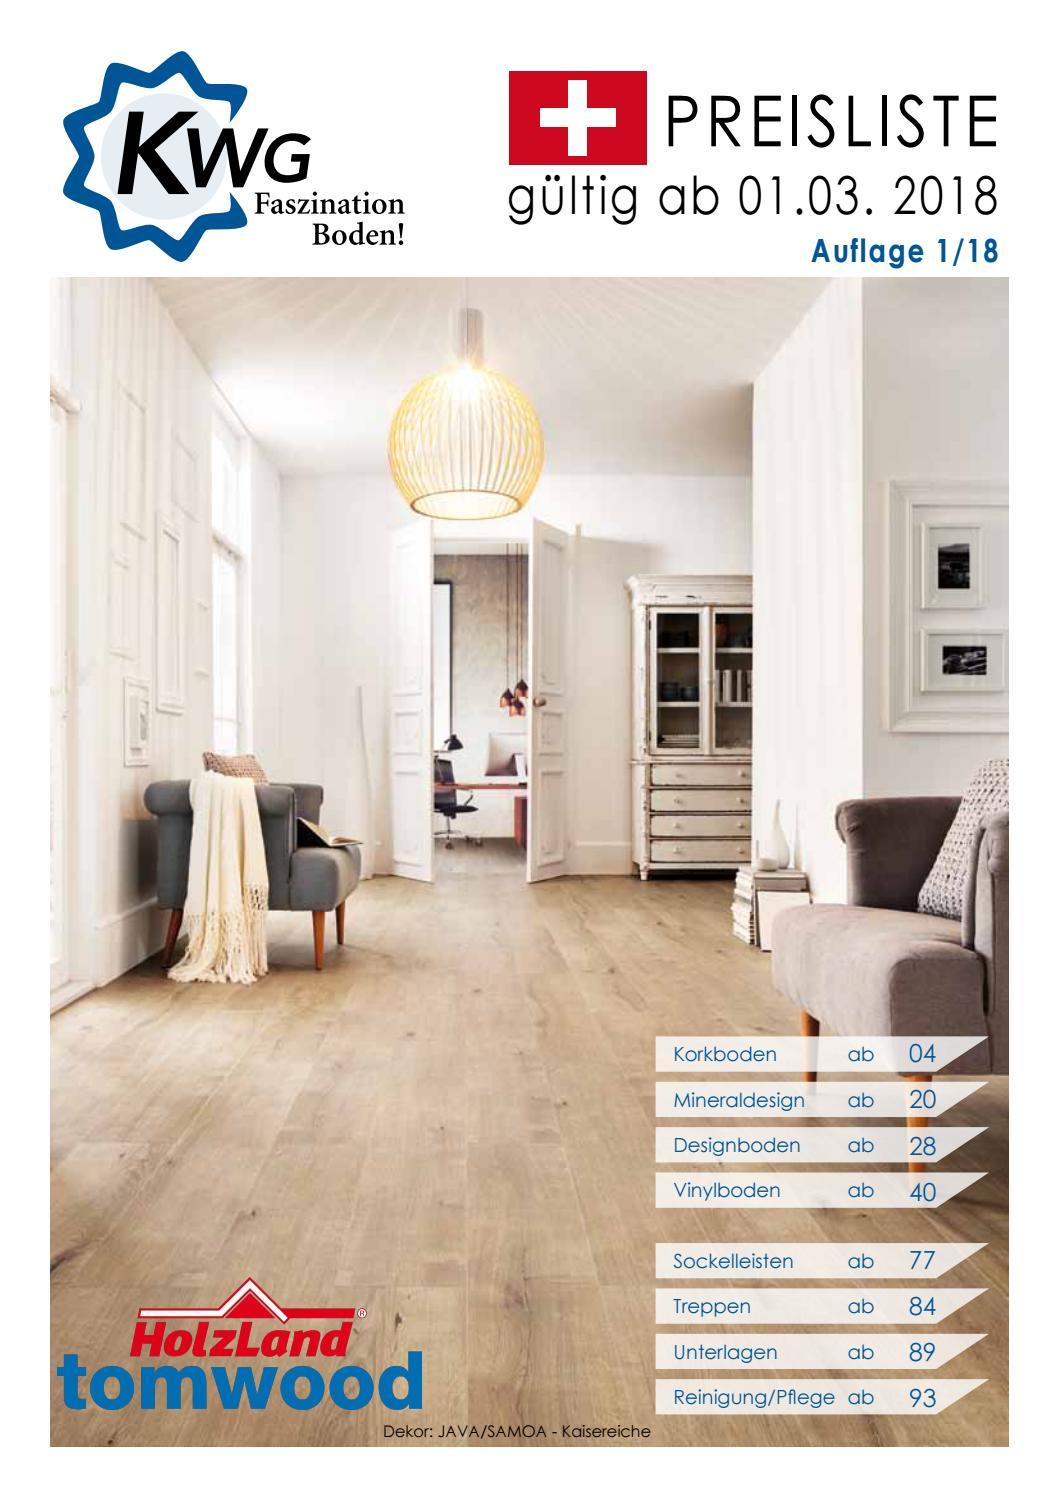 kwg bodenbel ge preisliste vinyl kork designboden by. Black Bedroom Furniture Sets. Home Design Ideas